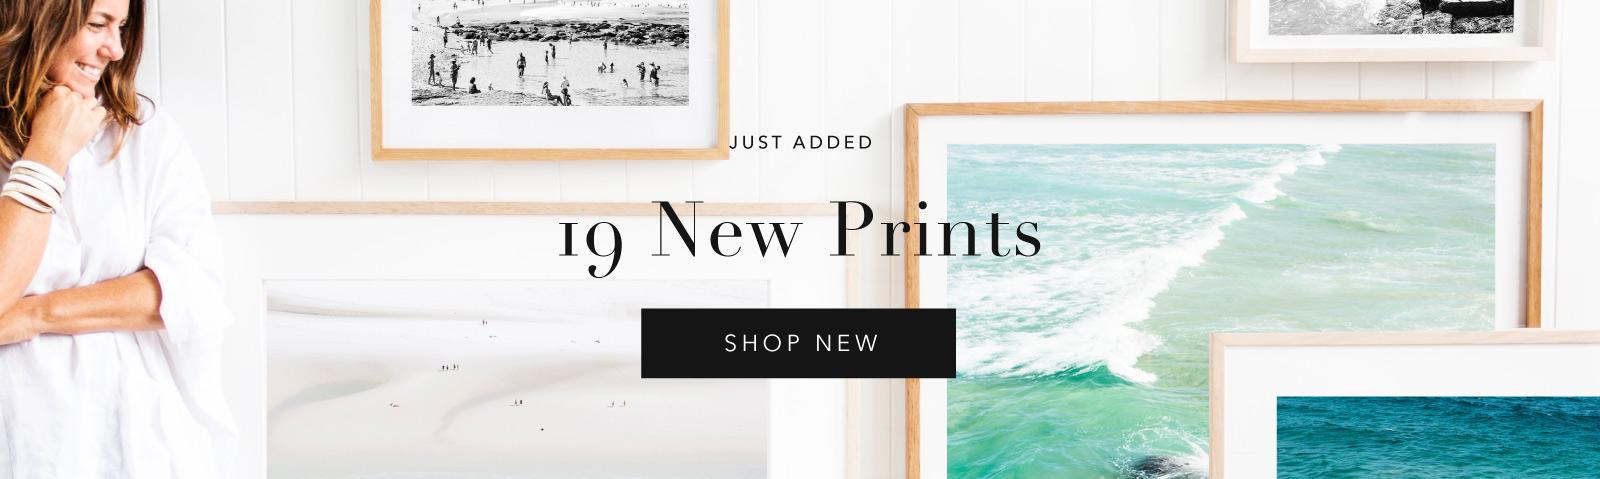 19-new-prints.jpg